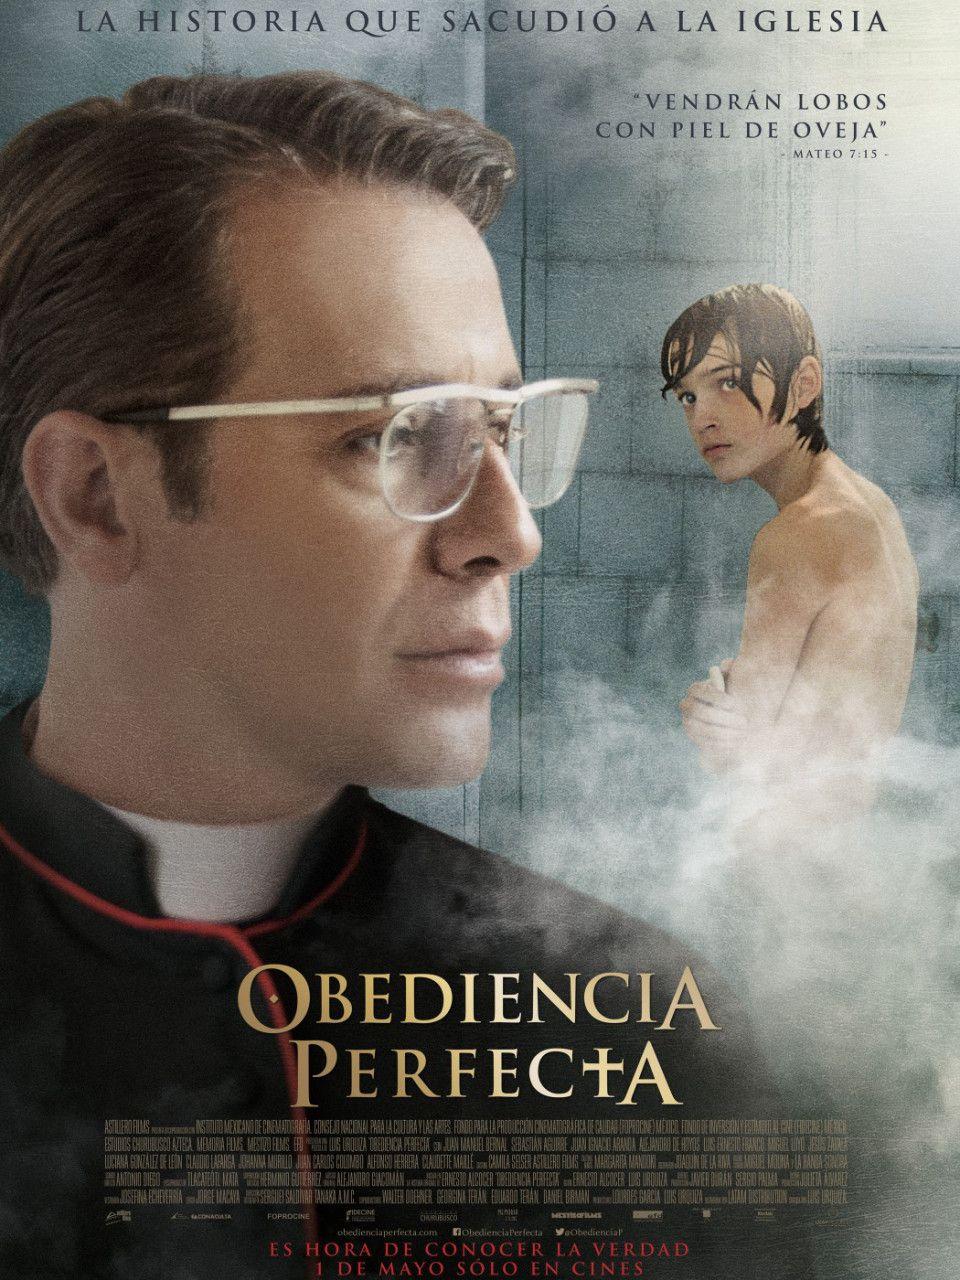 Orge in film